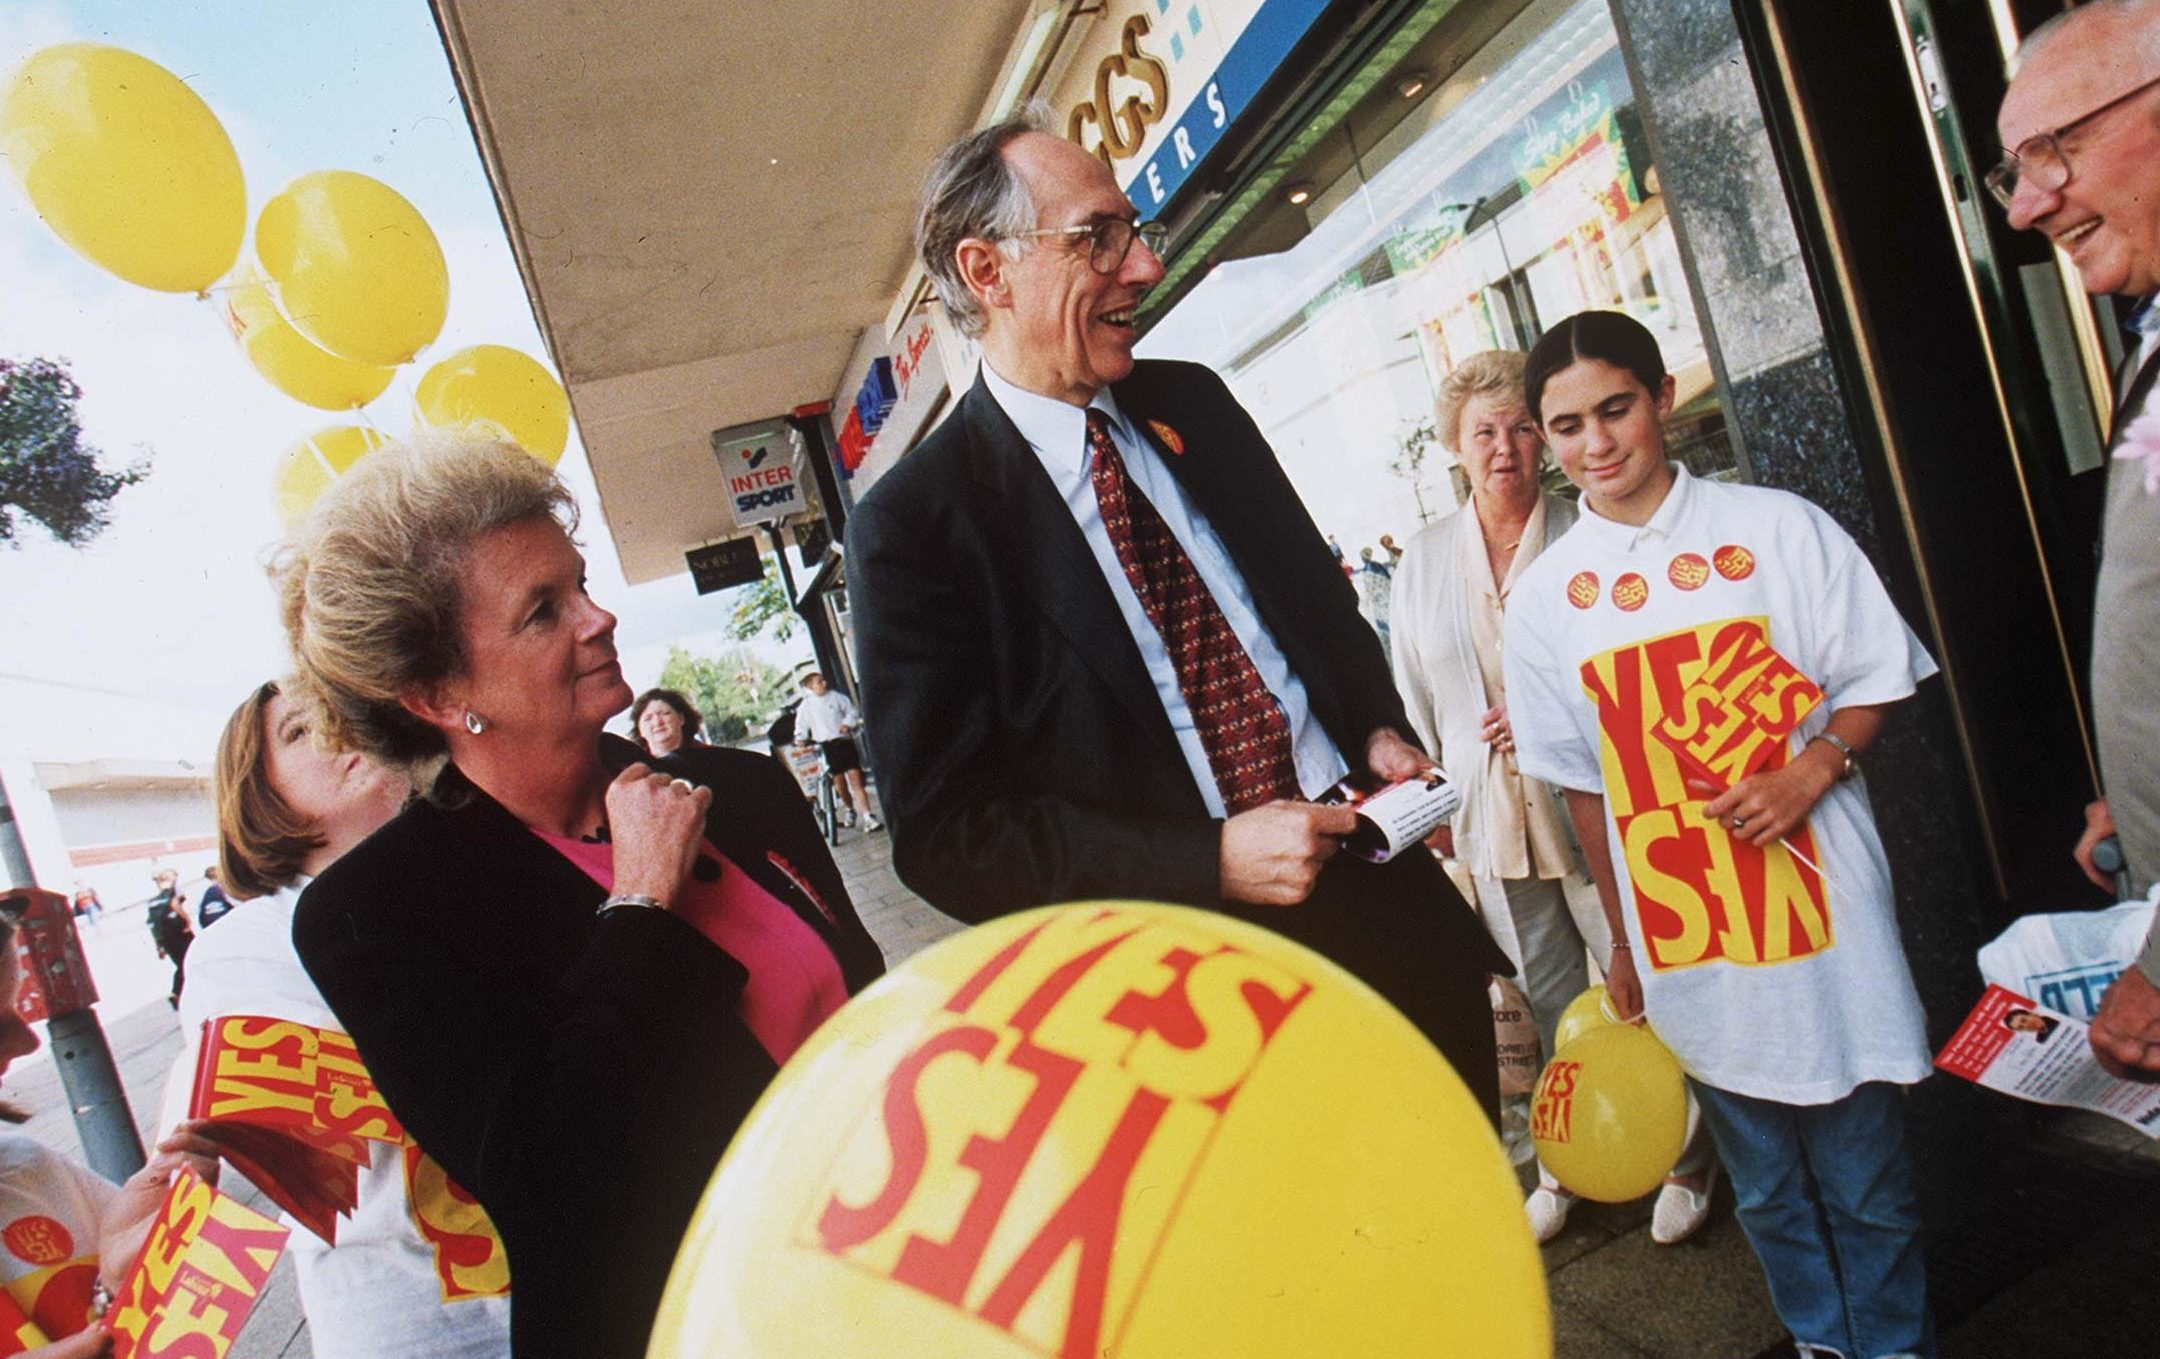 Donald Dewar campaigning for devolution, 1997 (SUTTON-HIBBERT/REX/Shutterstock)